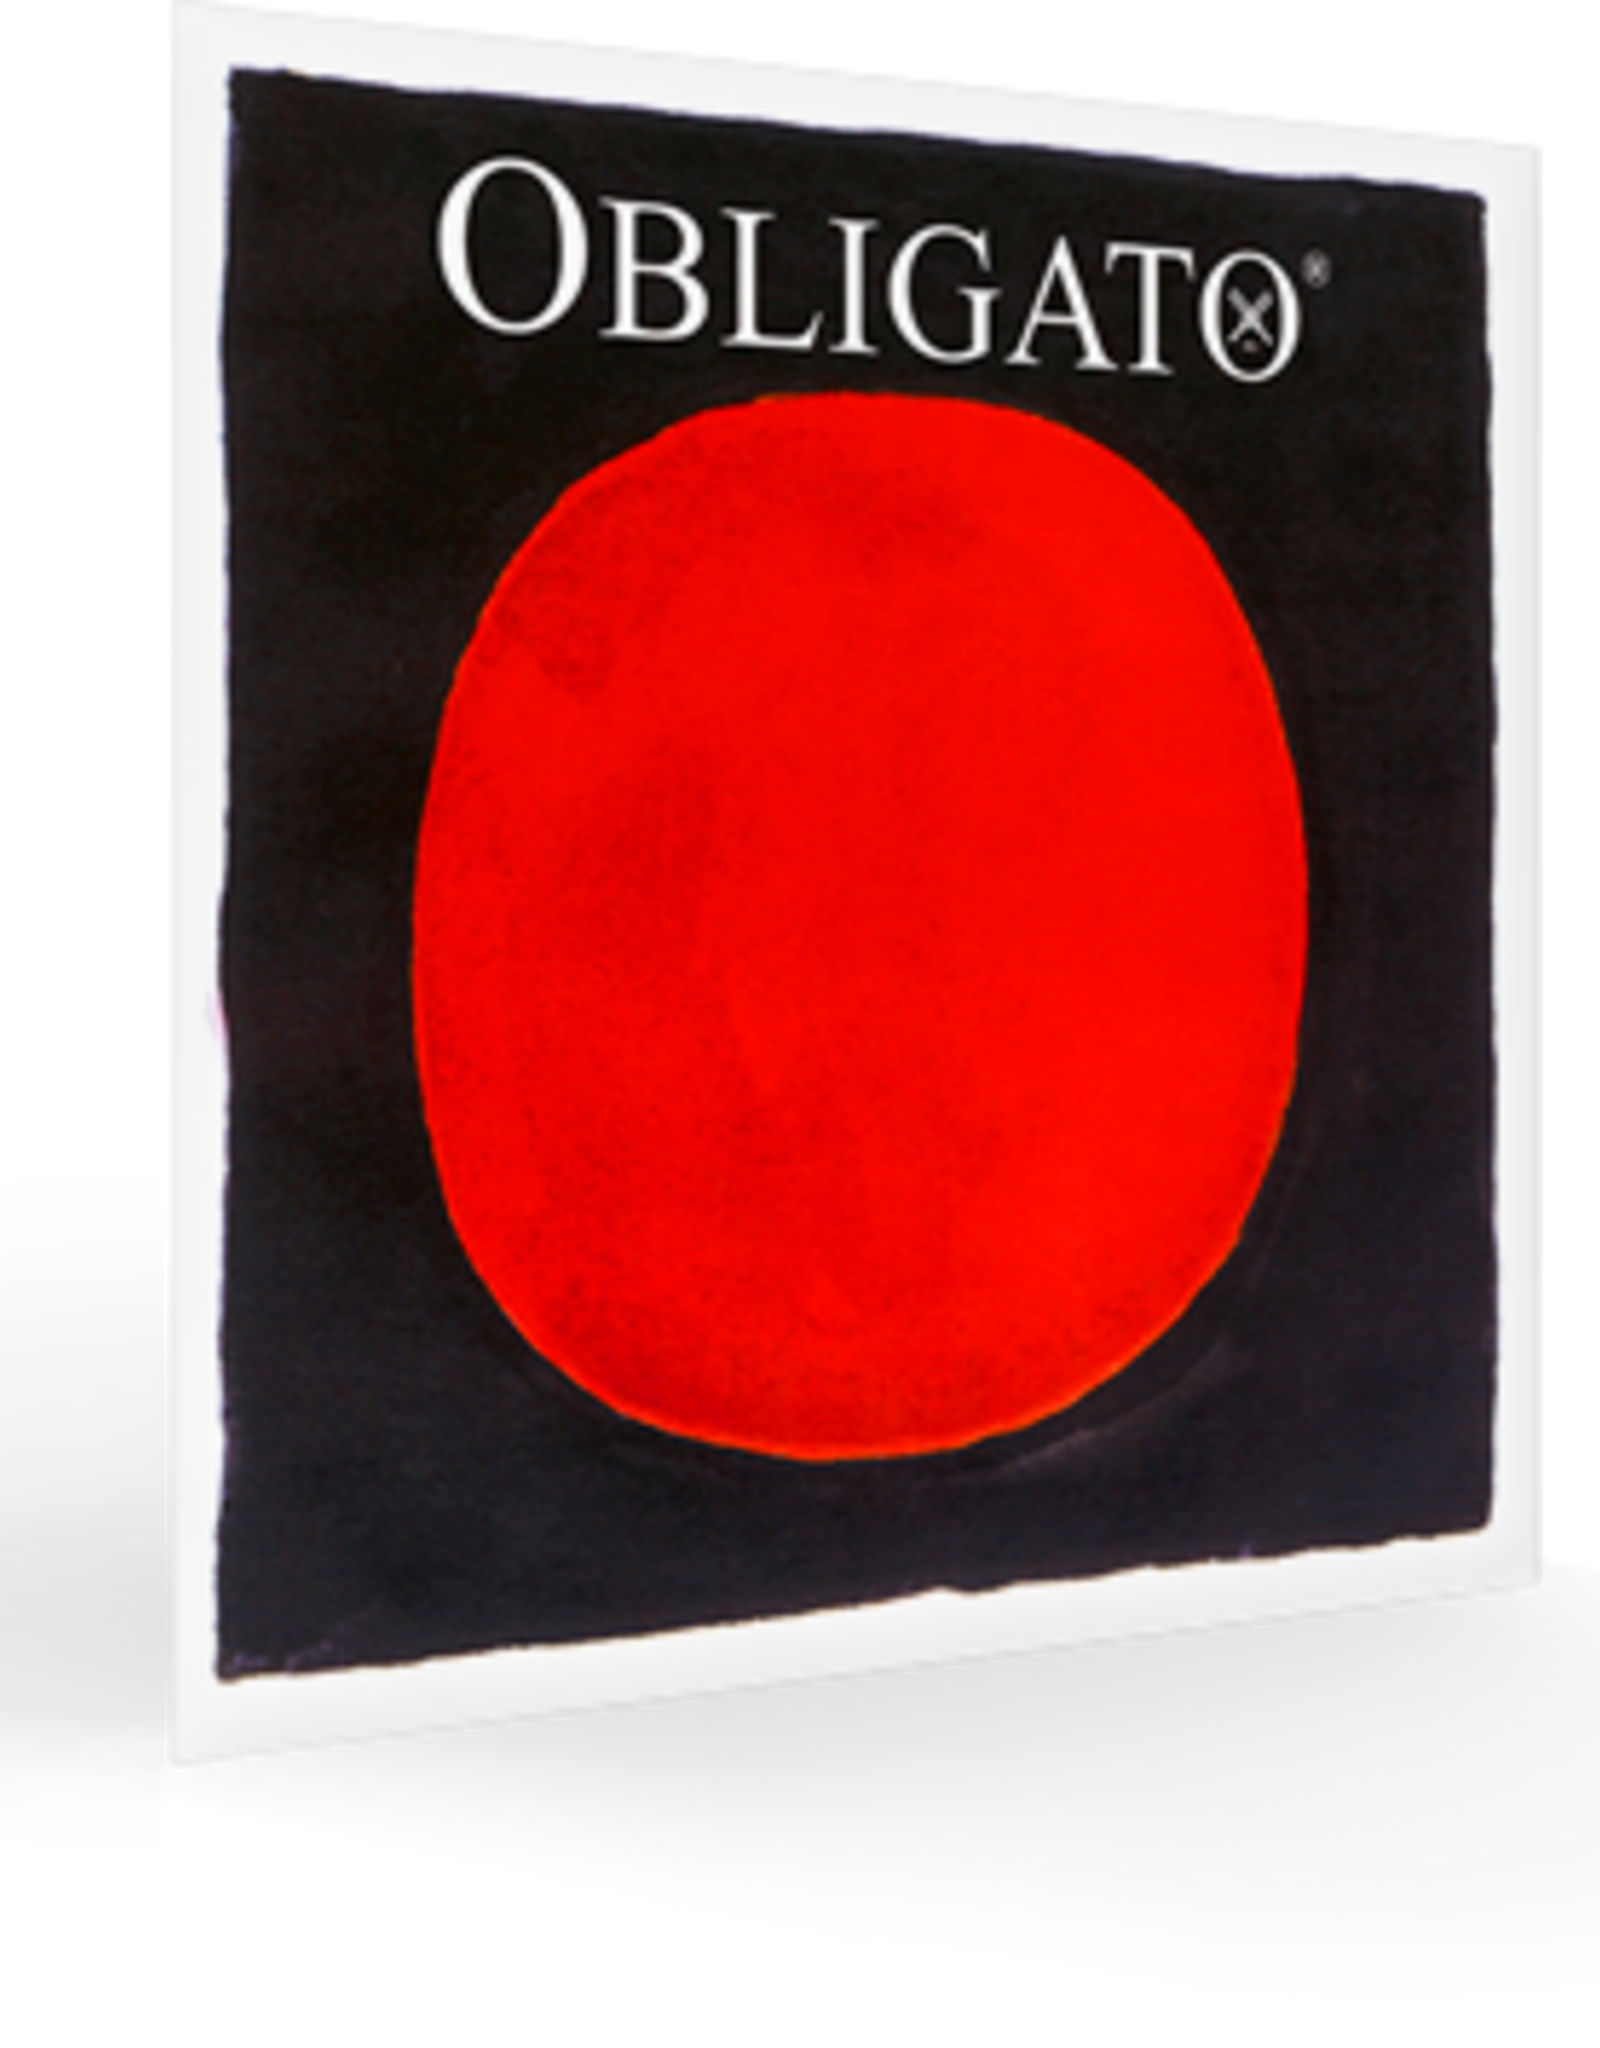 PIRASTRO Obligato vioolsnaar, re (d-3), 1/4-1/8